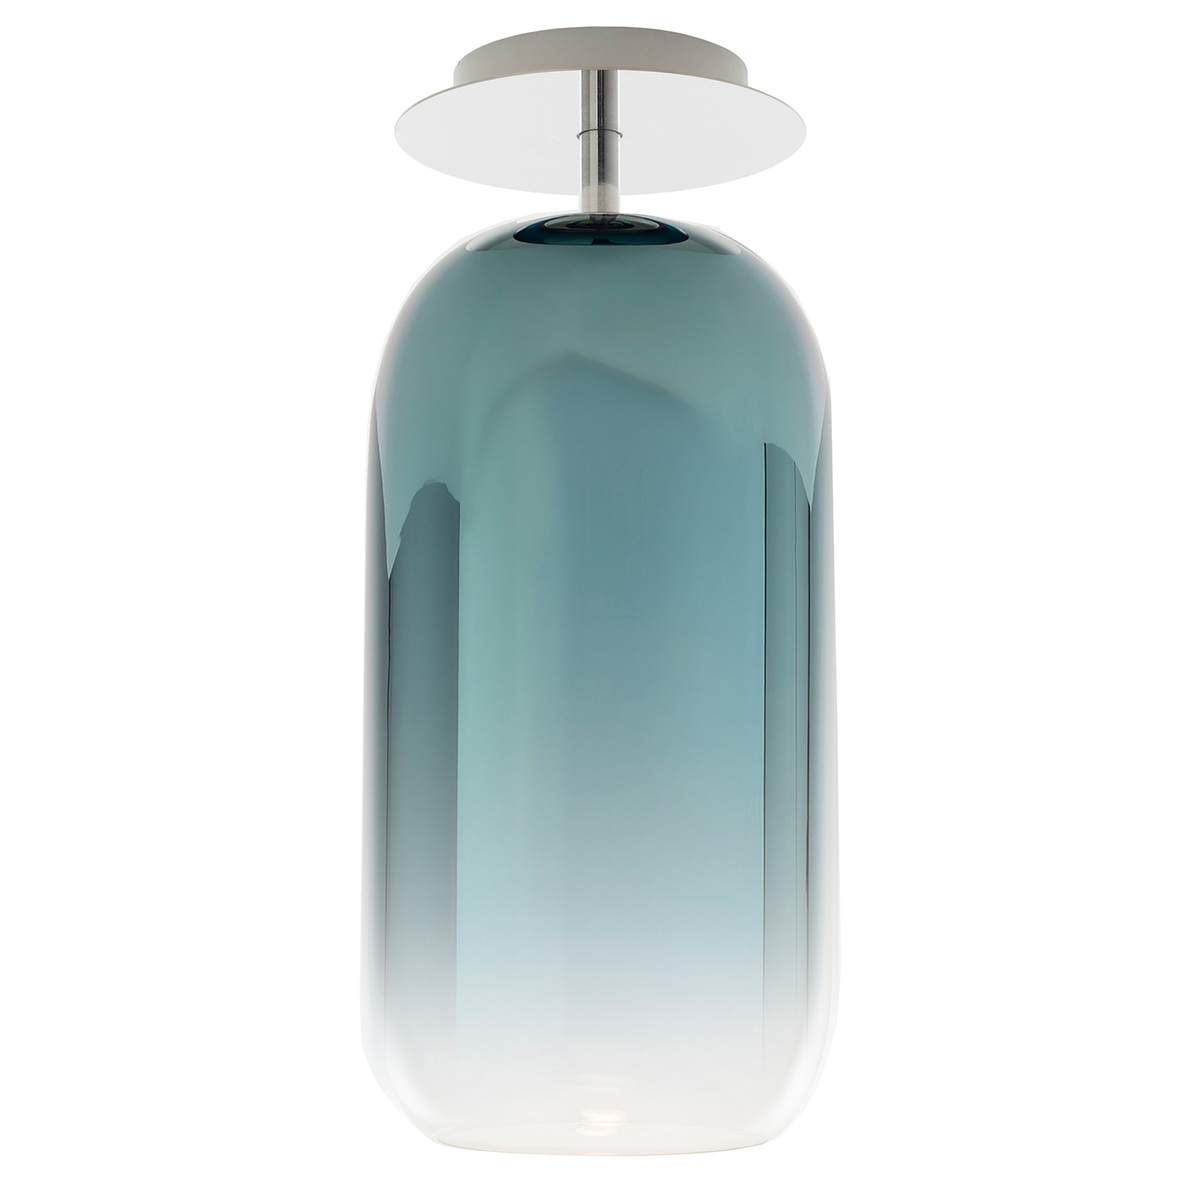 Artemide Gople Ceiling Lamp, Blue